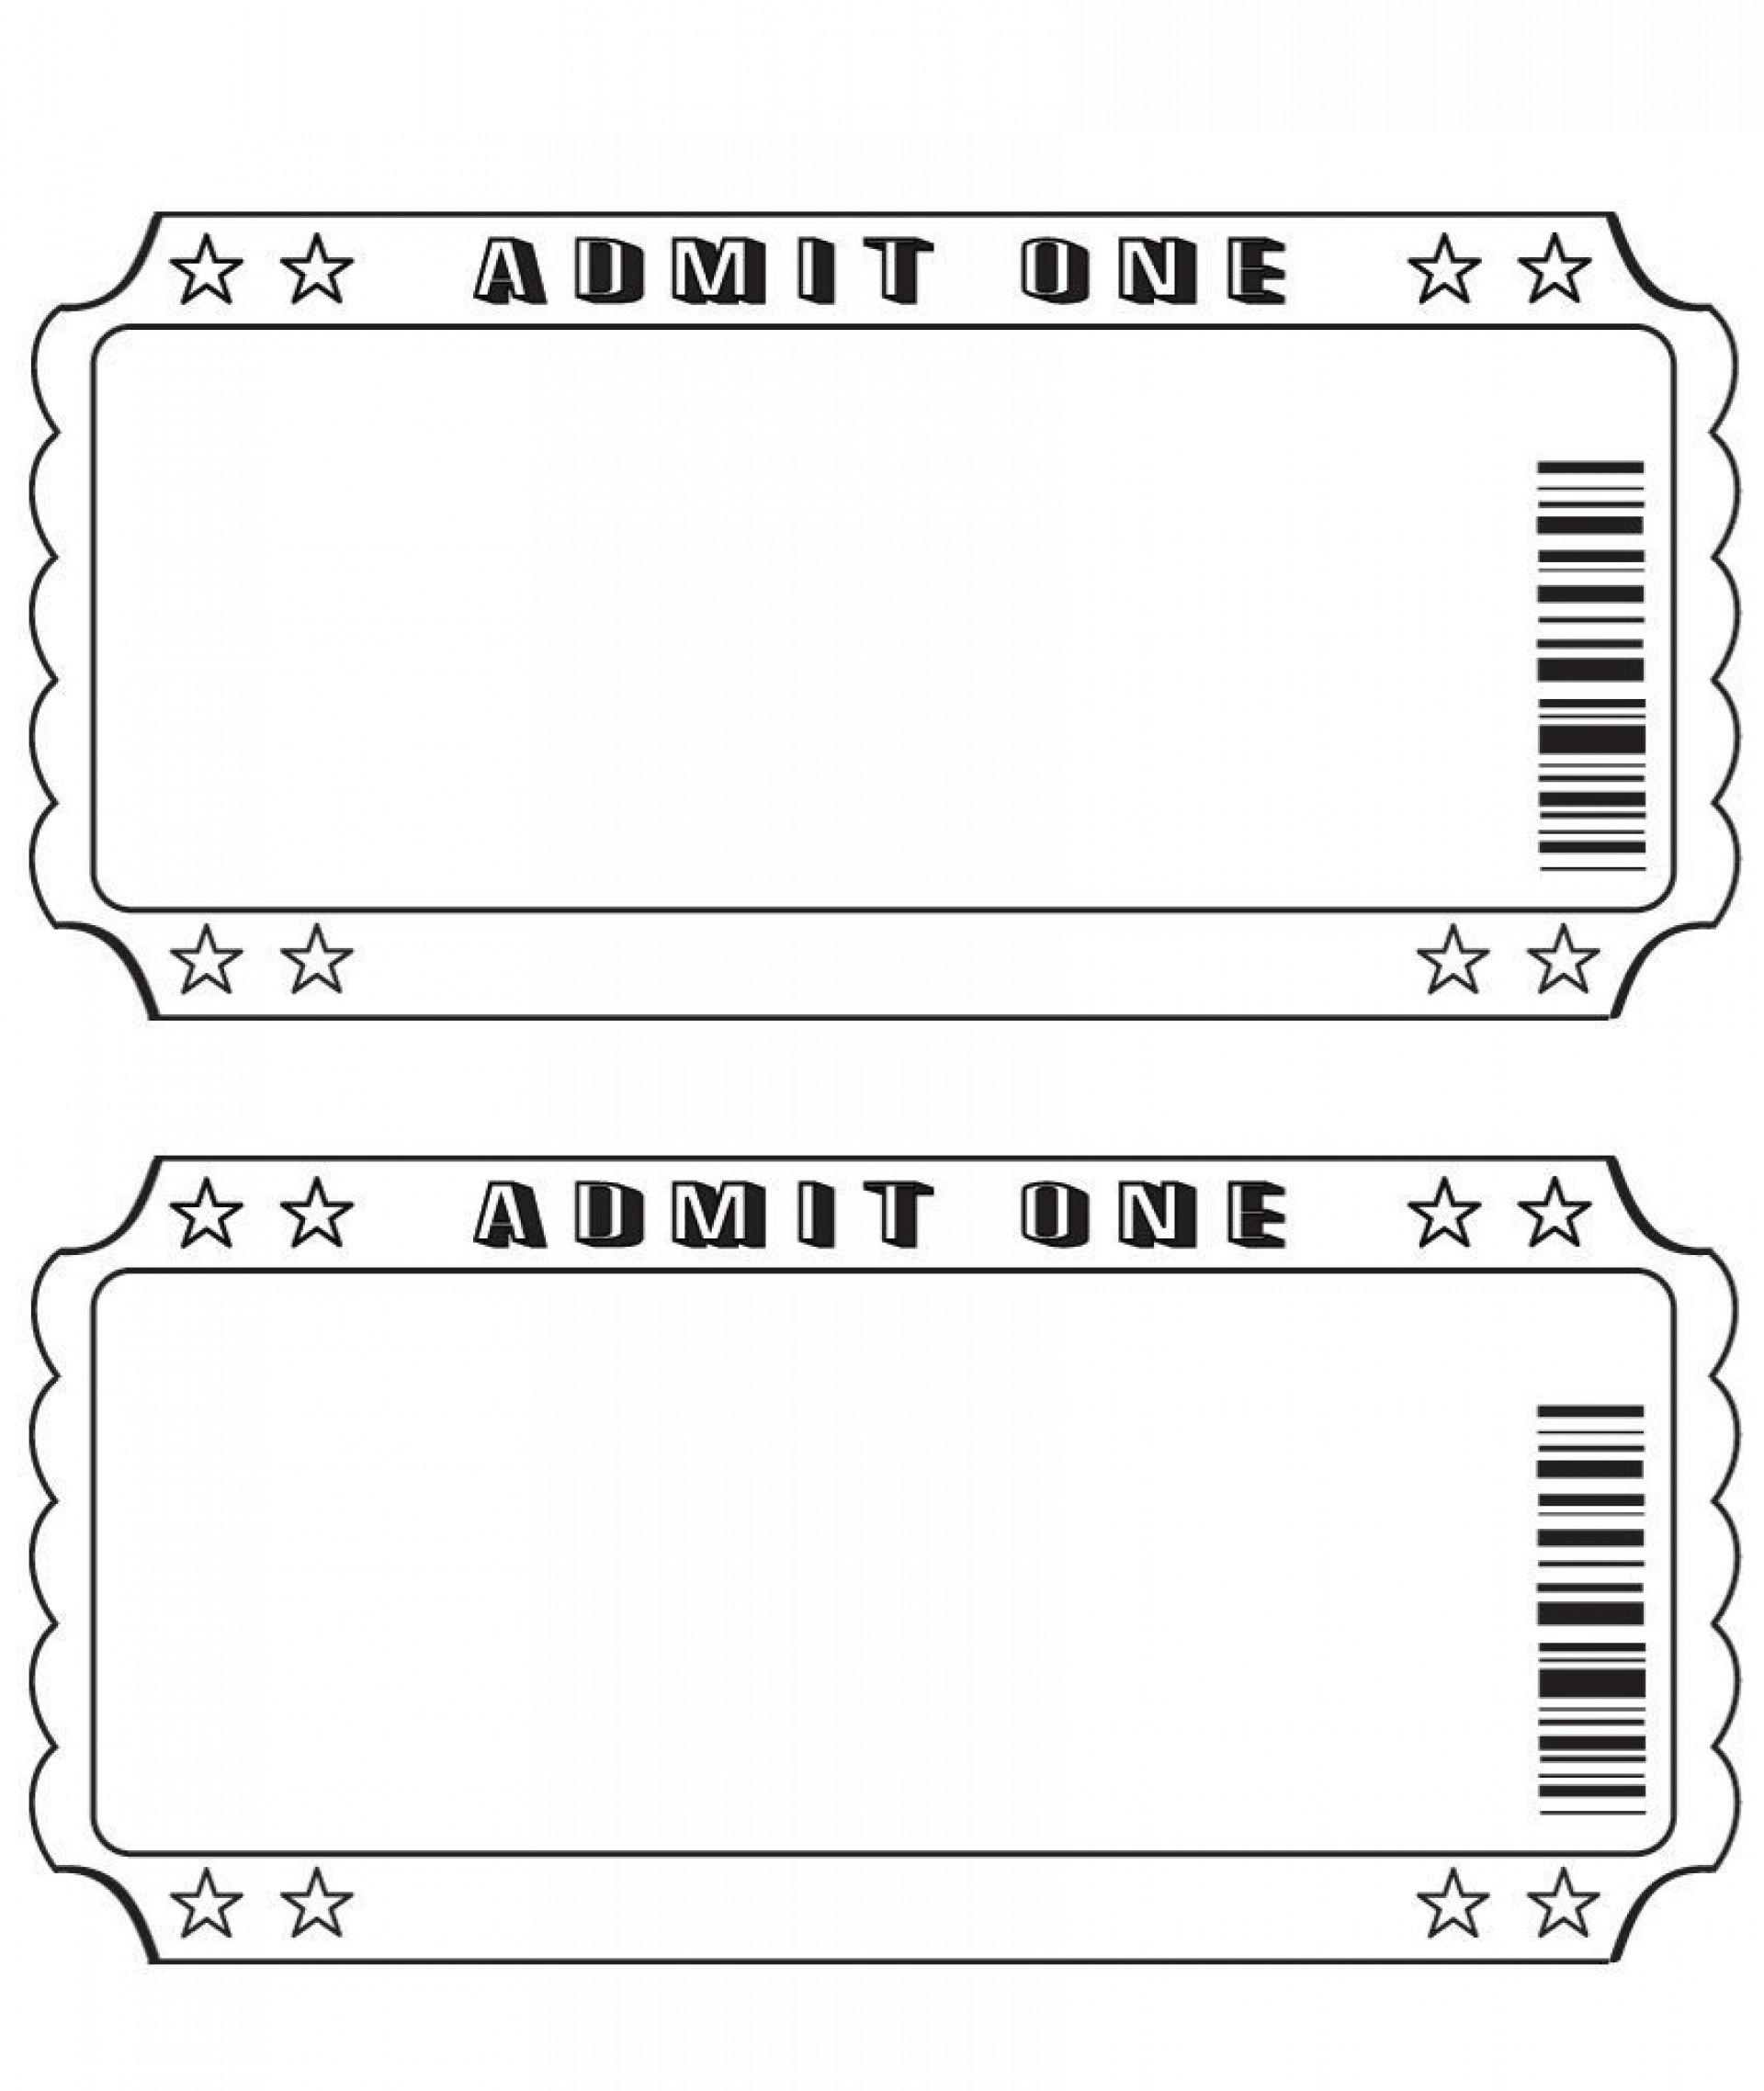 002 Sensational Free Concert Ticket Template Printable Photo  Gift1920